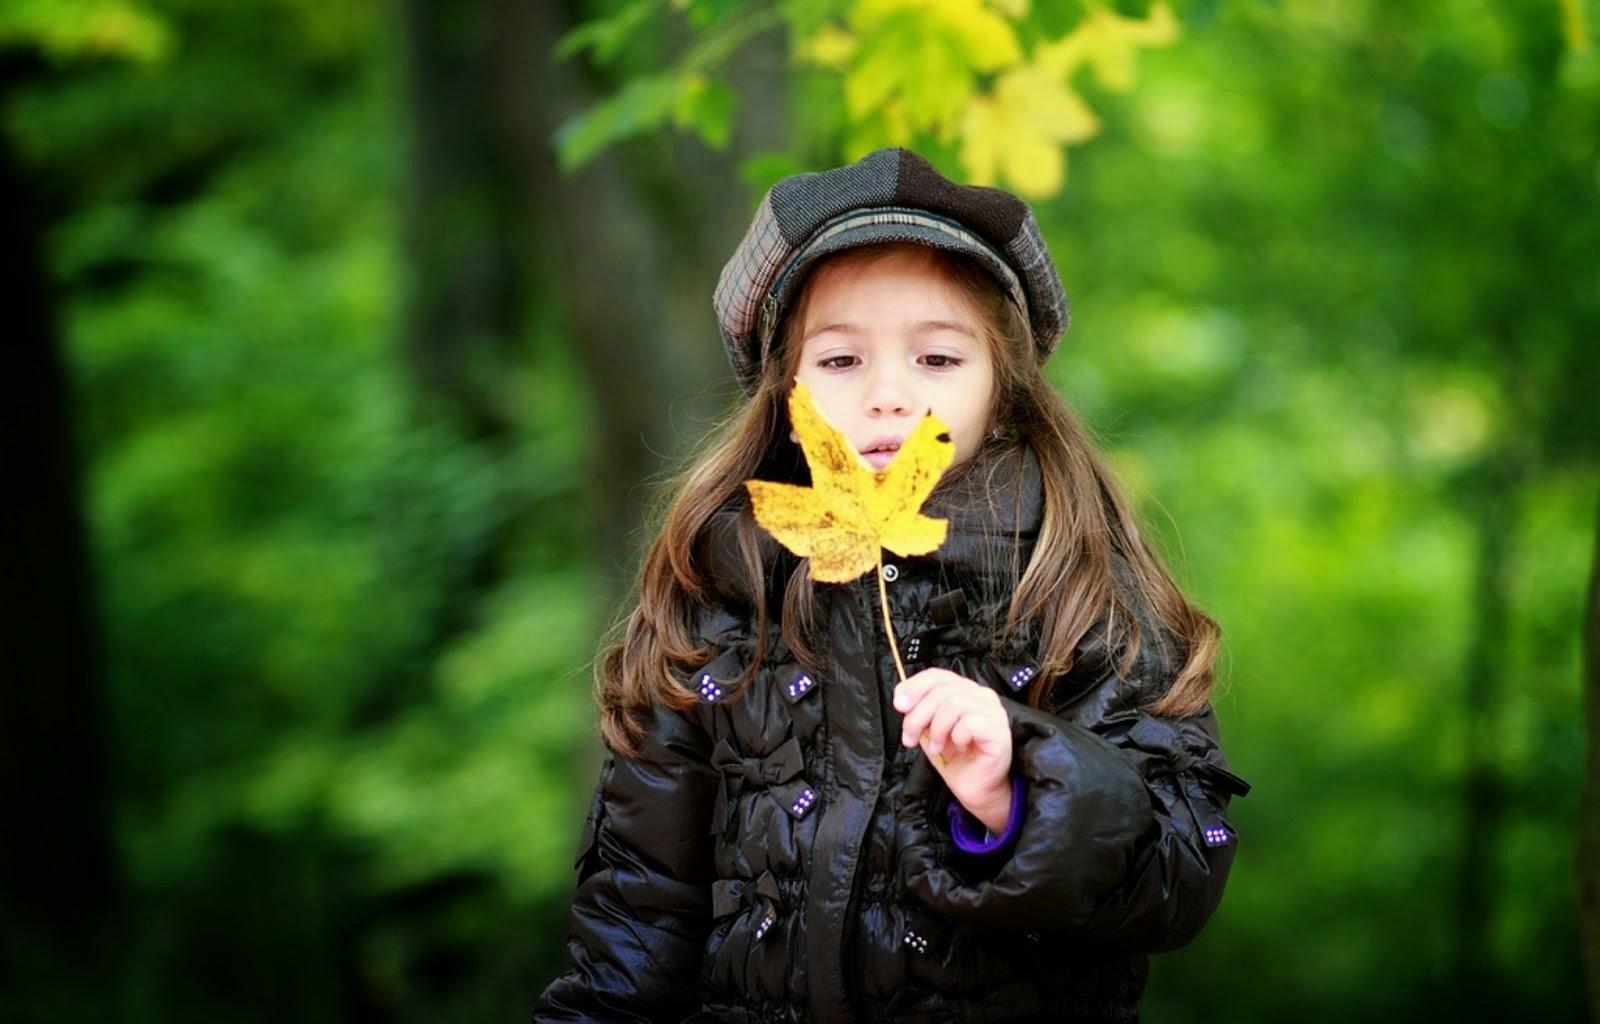 Foto Anak Kecil Lucu Dan Cantik